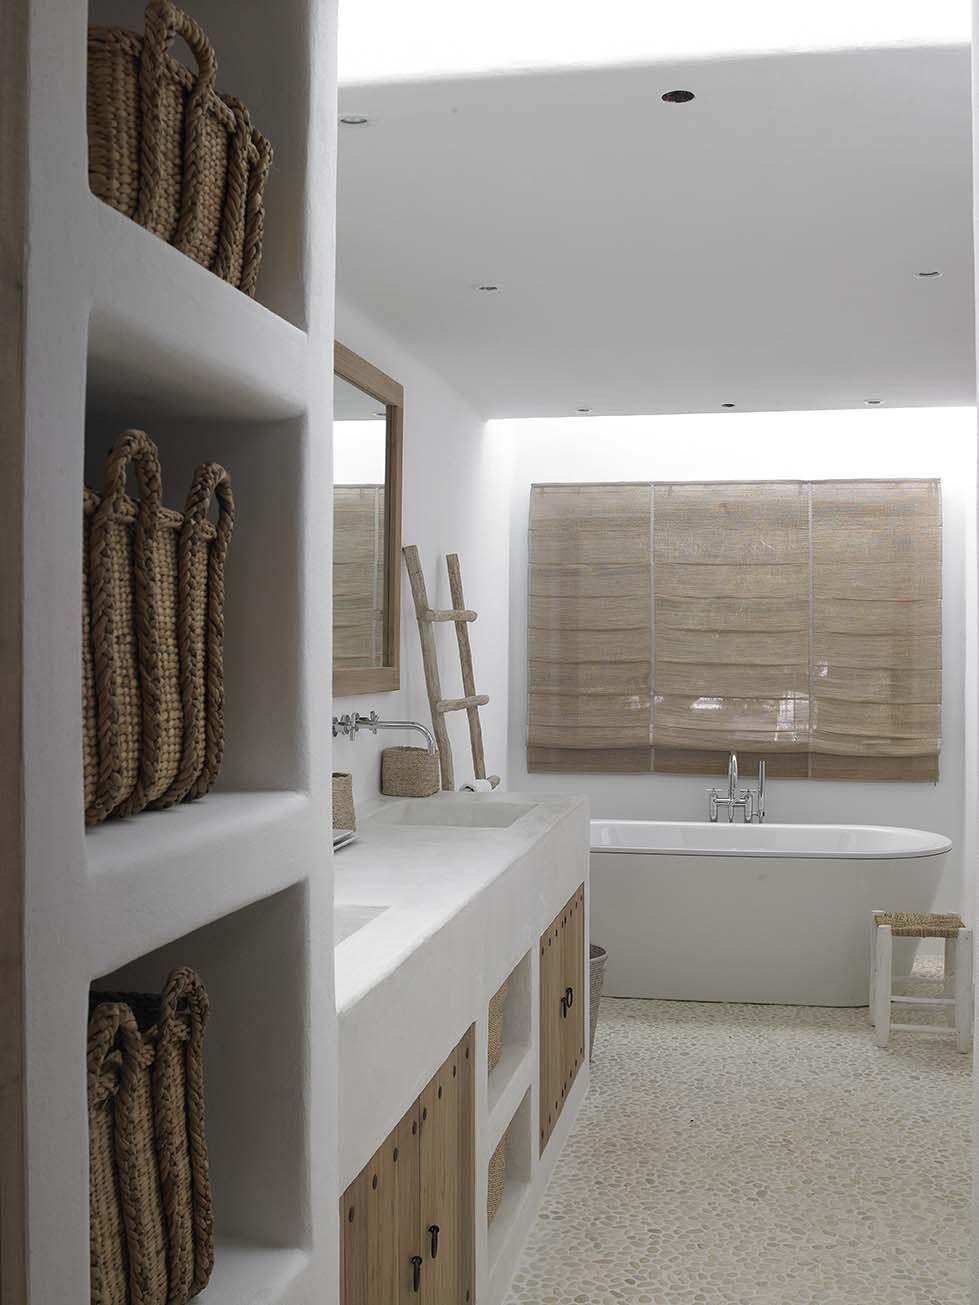 Küchenideen rustikal modern blakstad design consultants  projects  keuken en badkamer